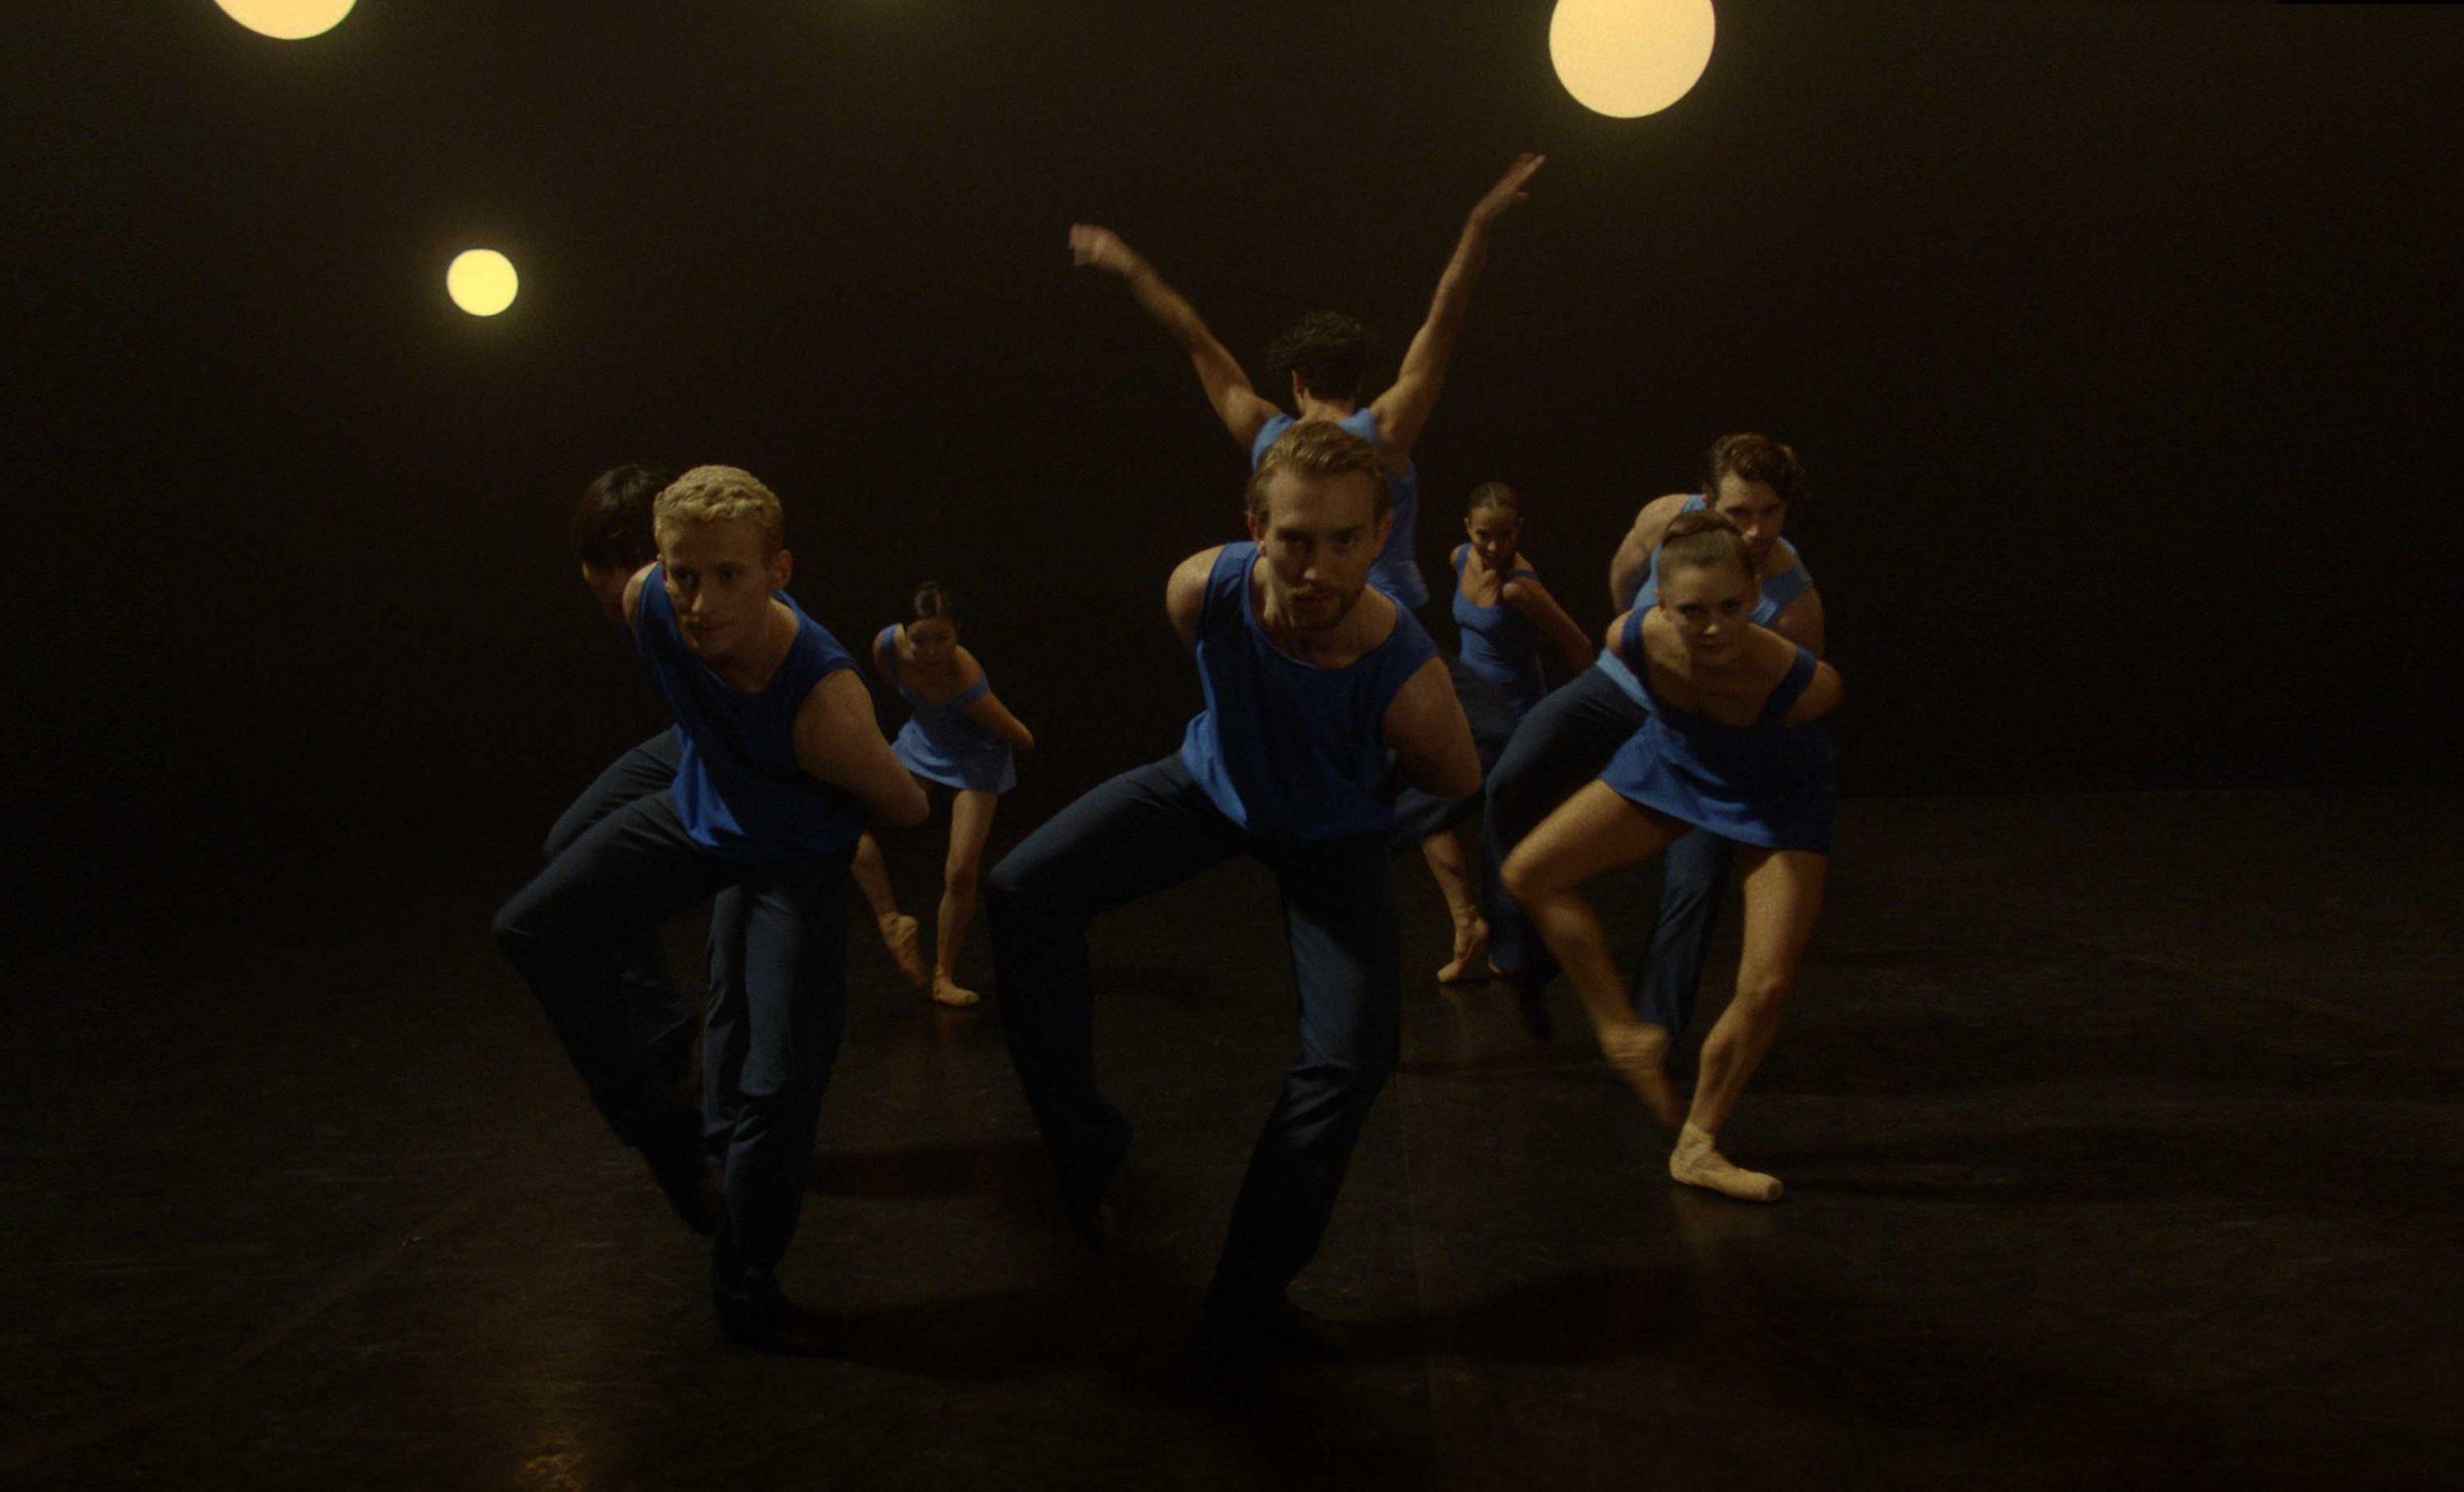 English National Ballet dancers in Stina Quagebeur's Take Five Blues